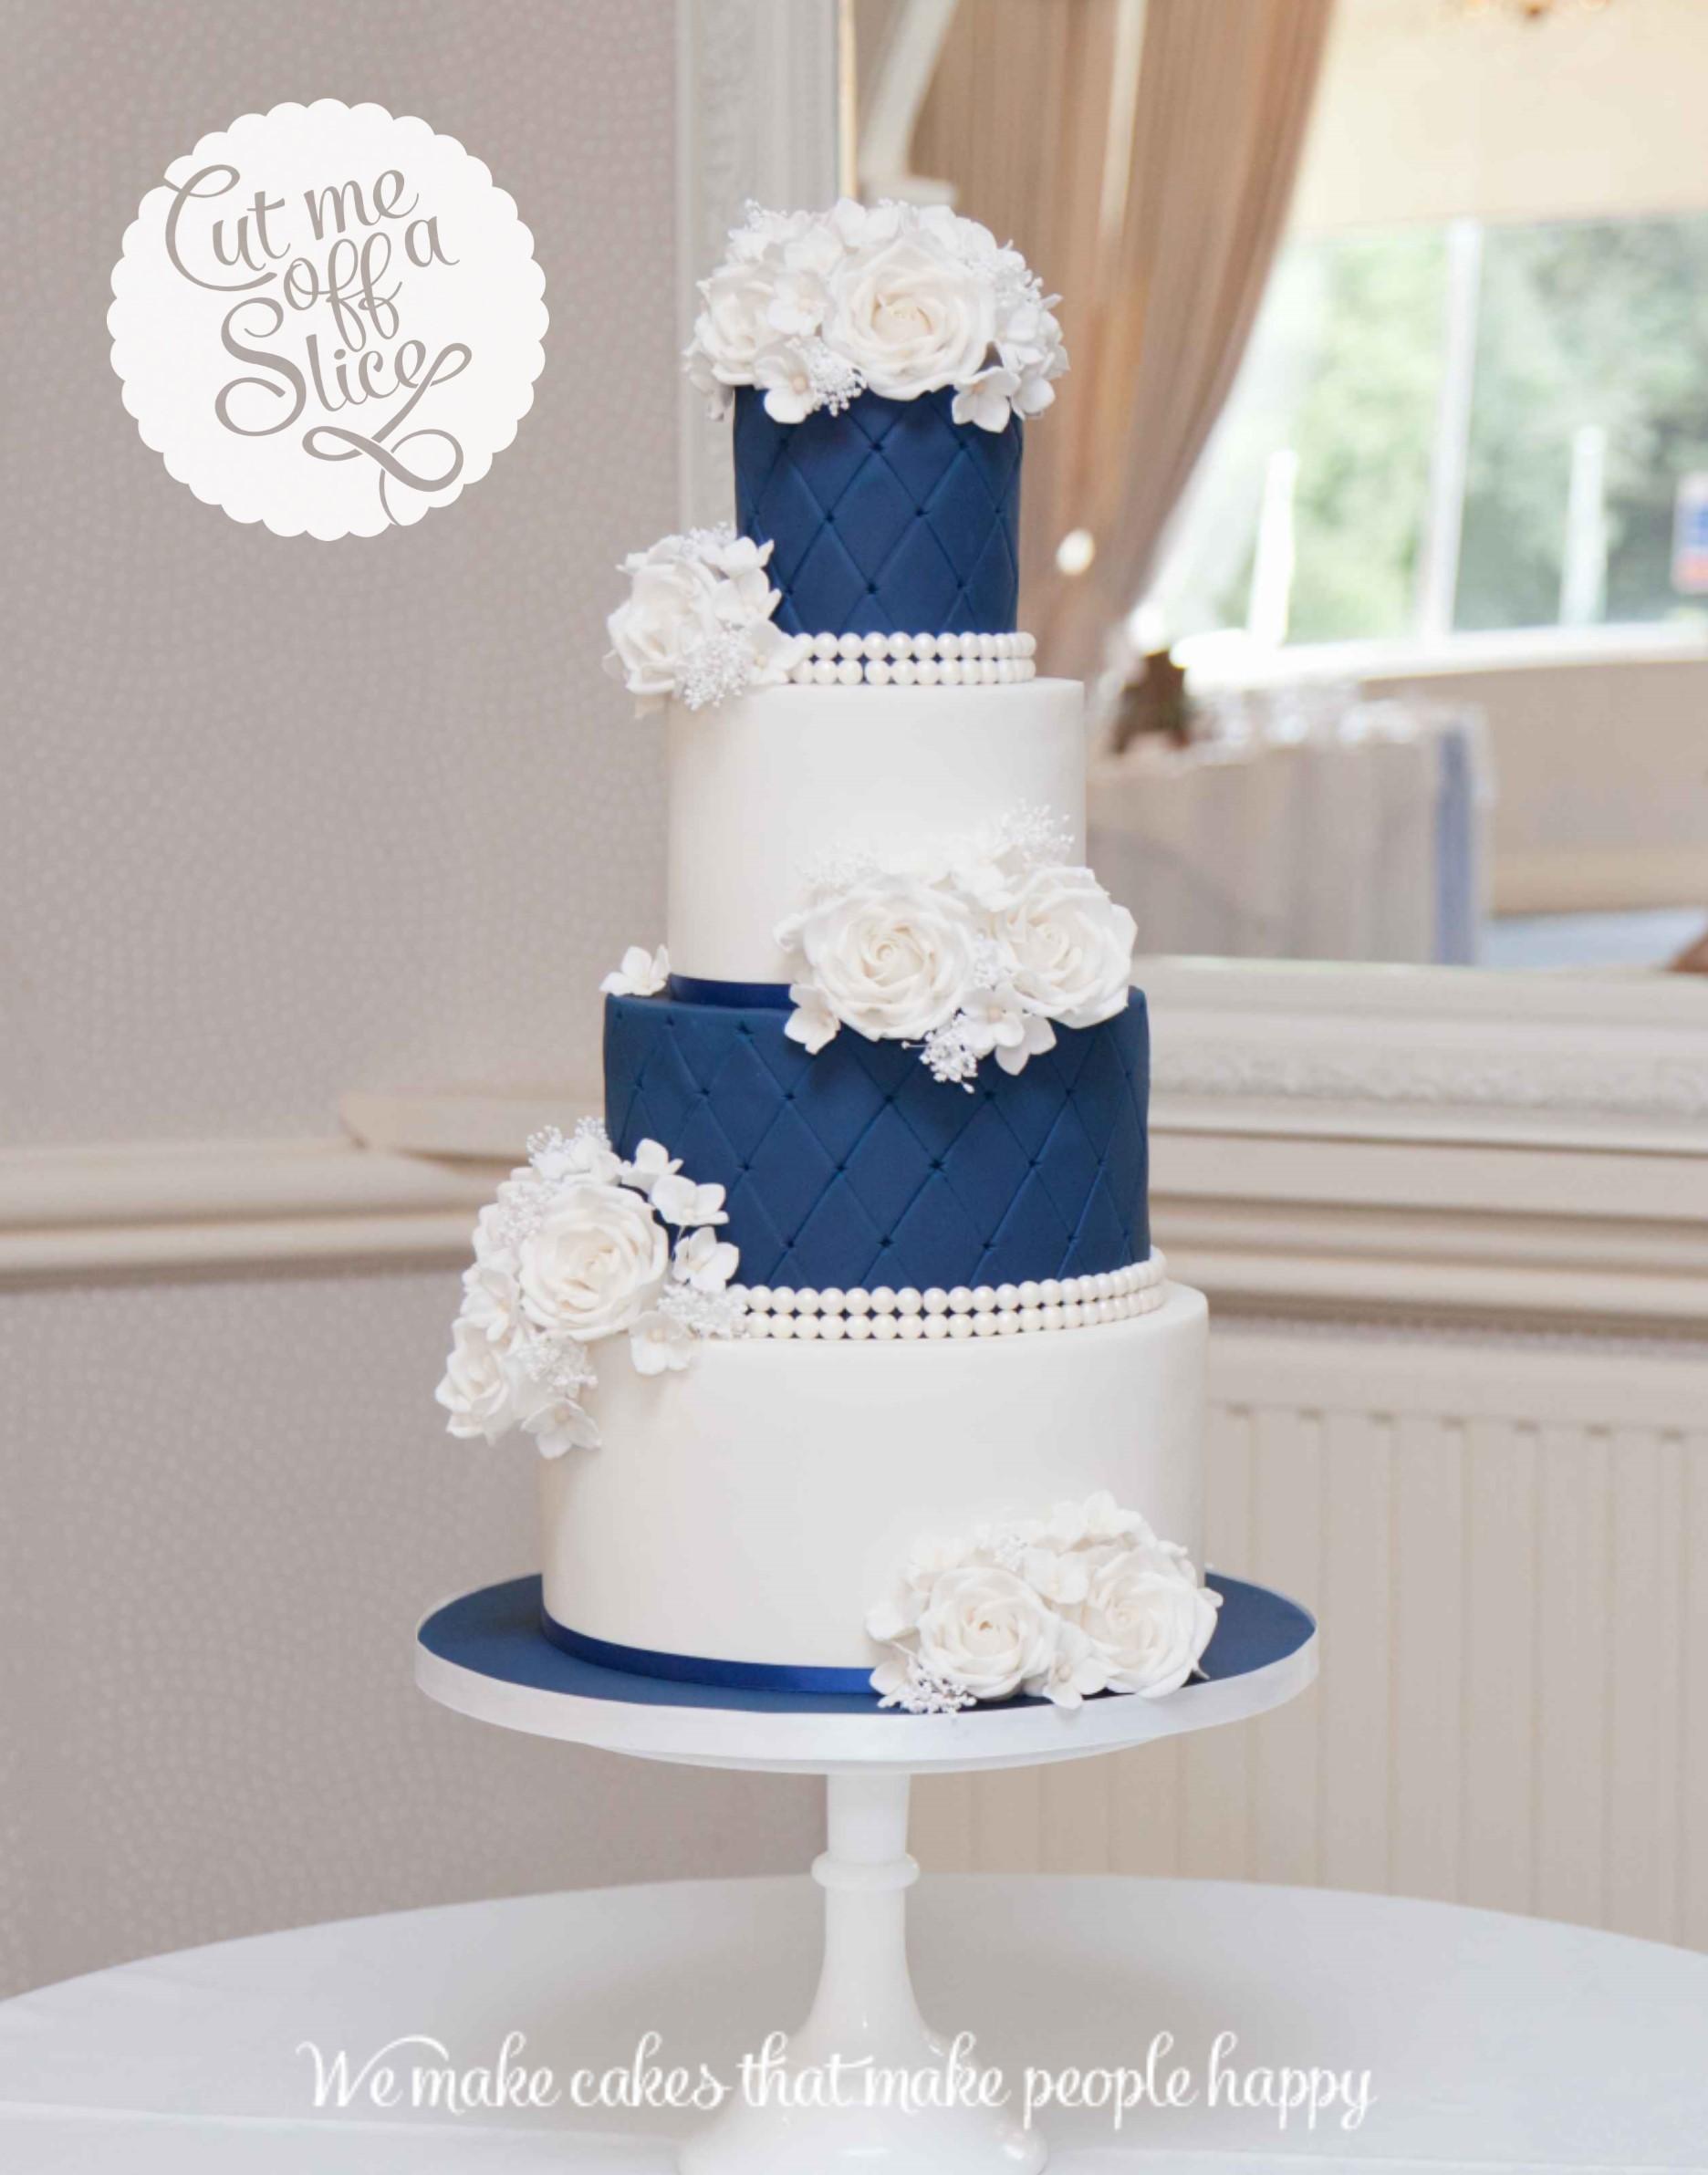 Bespoke Wedding Cake By Cut Me Off A Slice